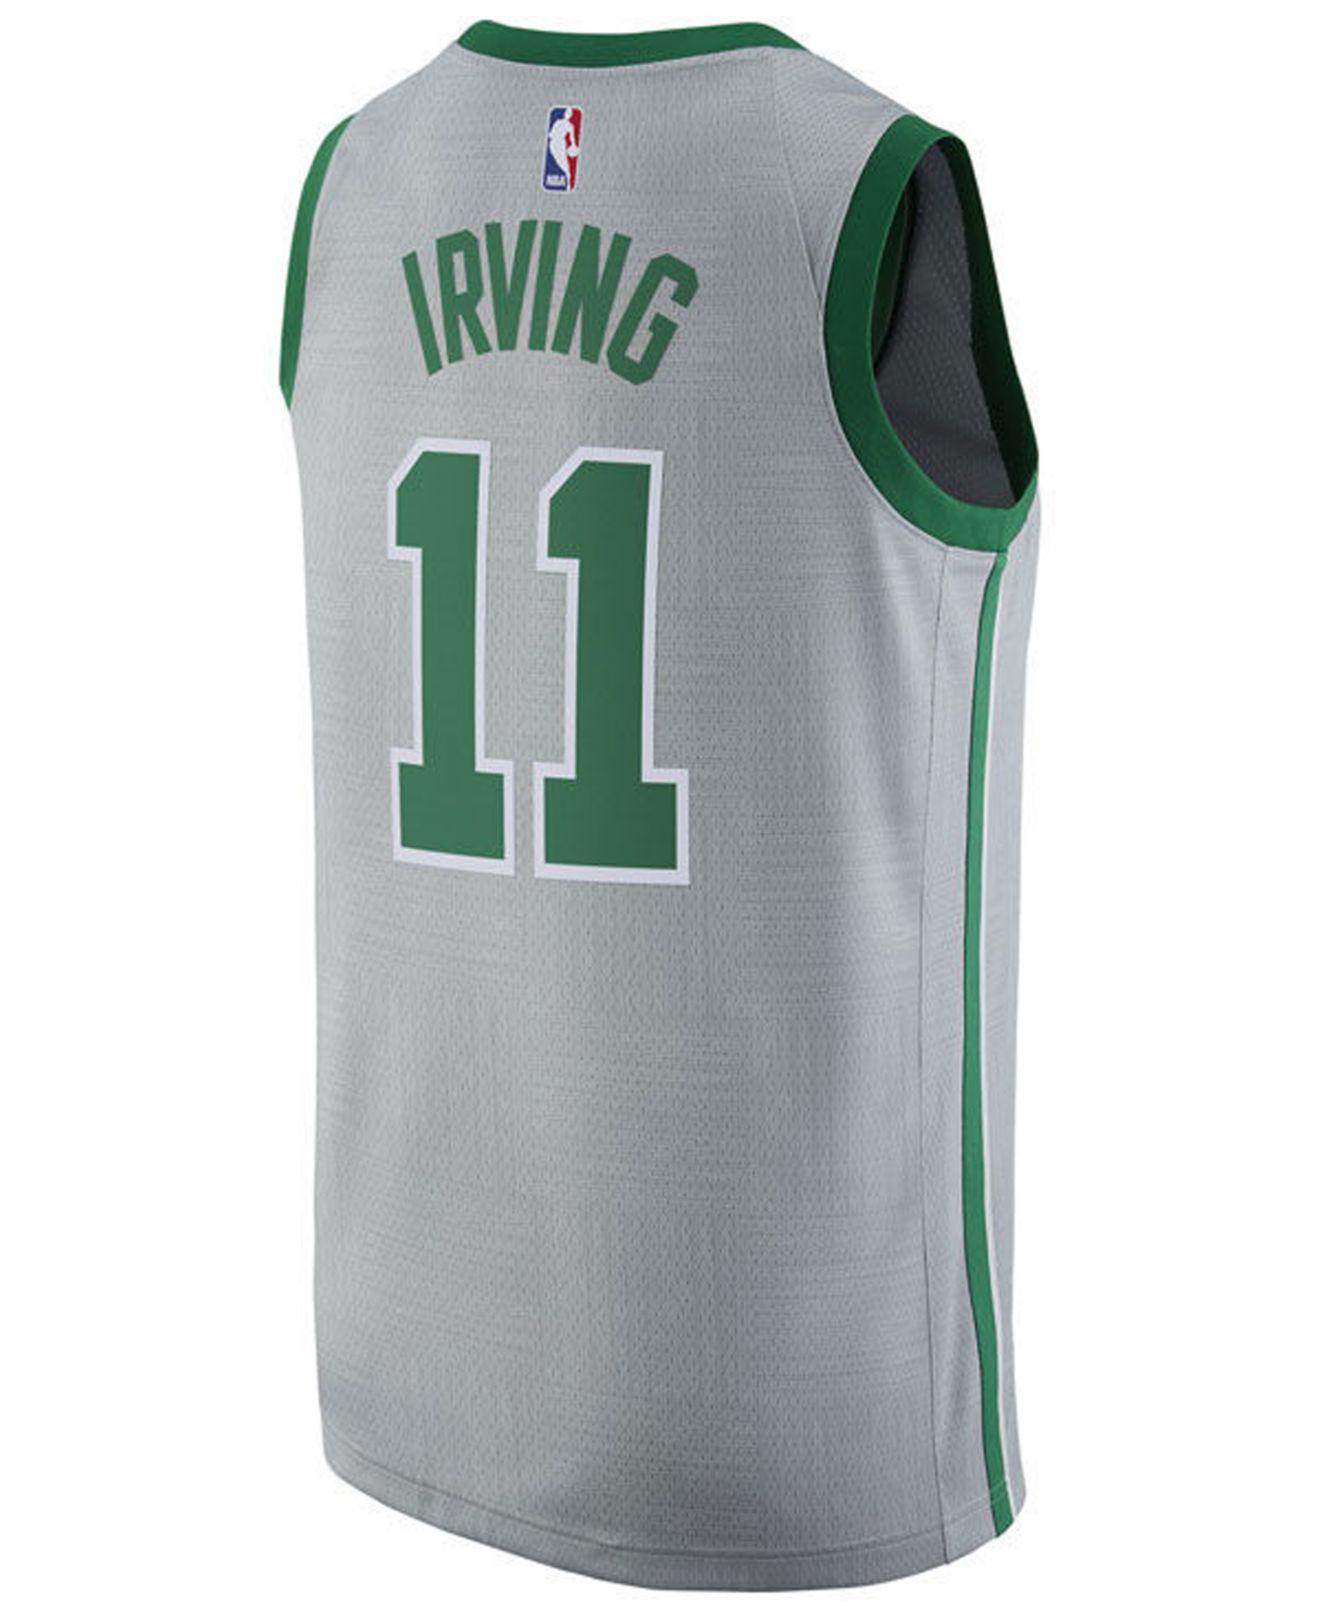 pick up 25ad6 04cb5 Men's Gray Kyrie Irving Boston Celtics City Swingman Jersey